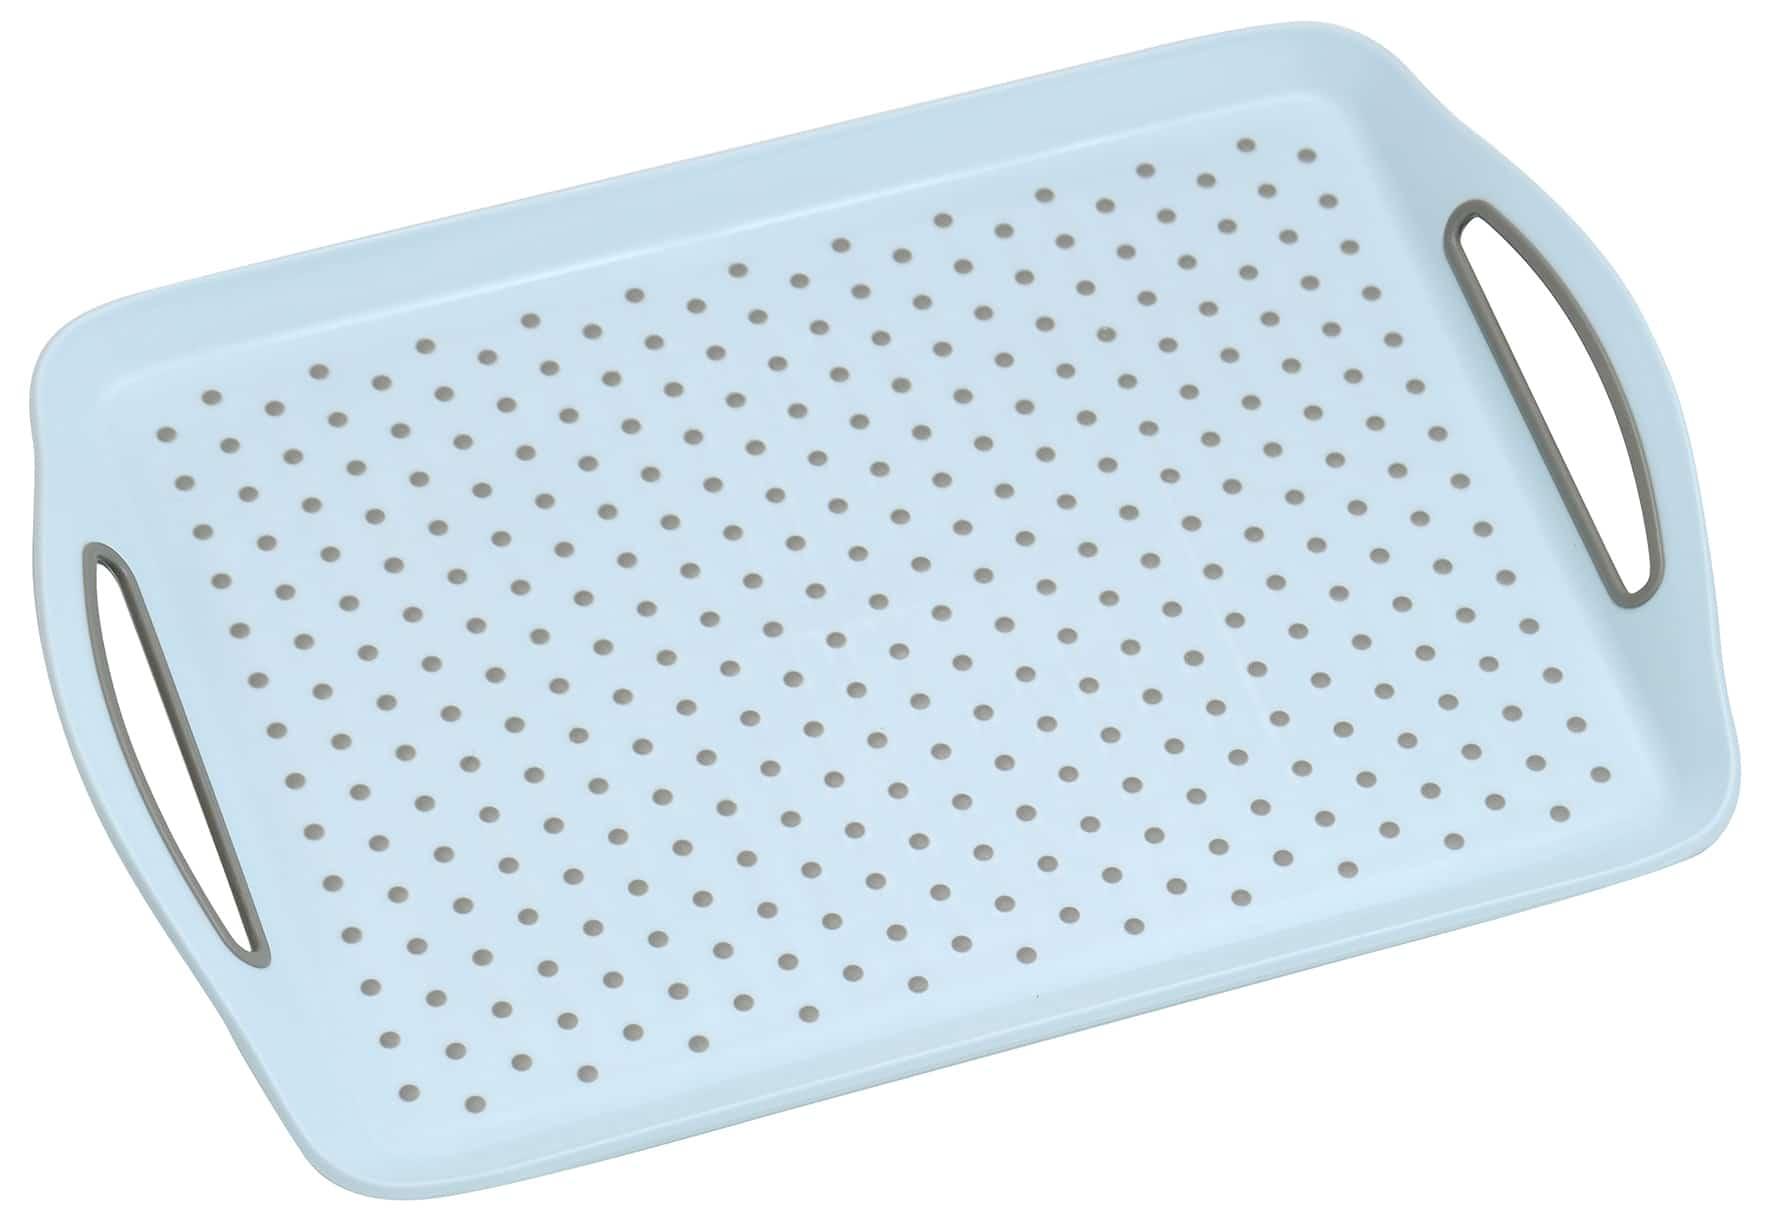 Anti-slip dienblad 45,5x32x4,5 cm - Dienblad Rechthoek - Blauw